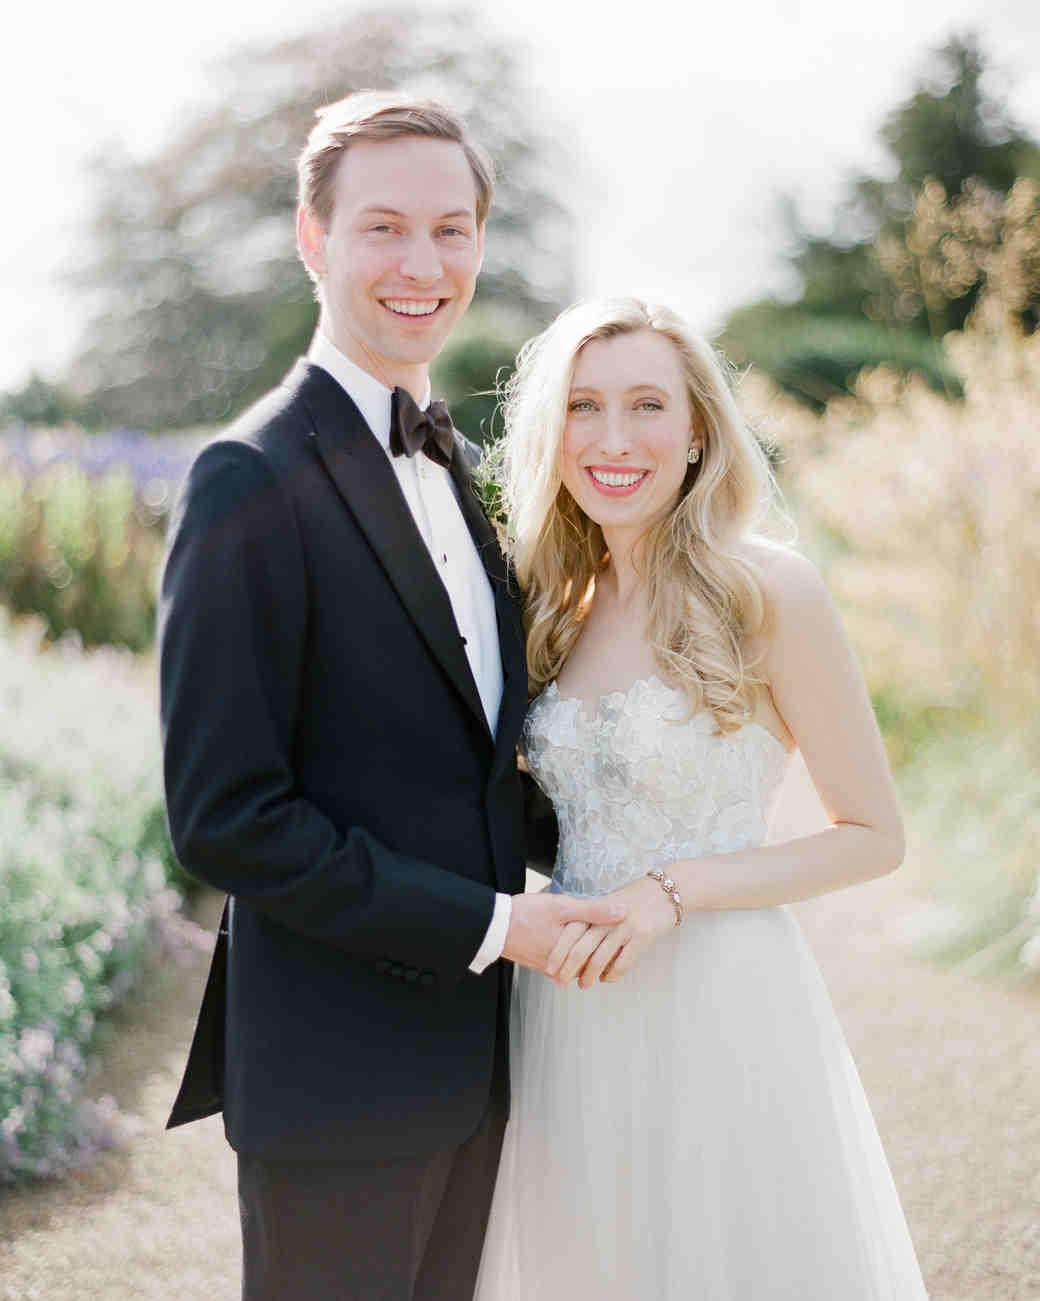 jo-andrew-wedding-ireland-1333-s112147.jpg